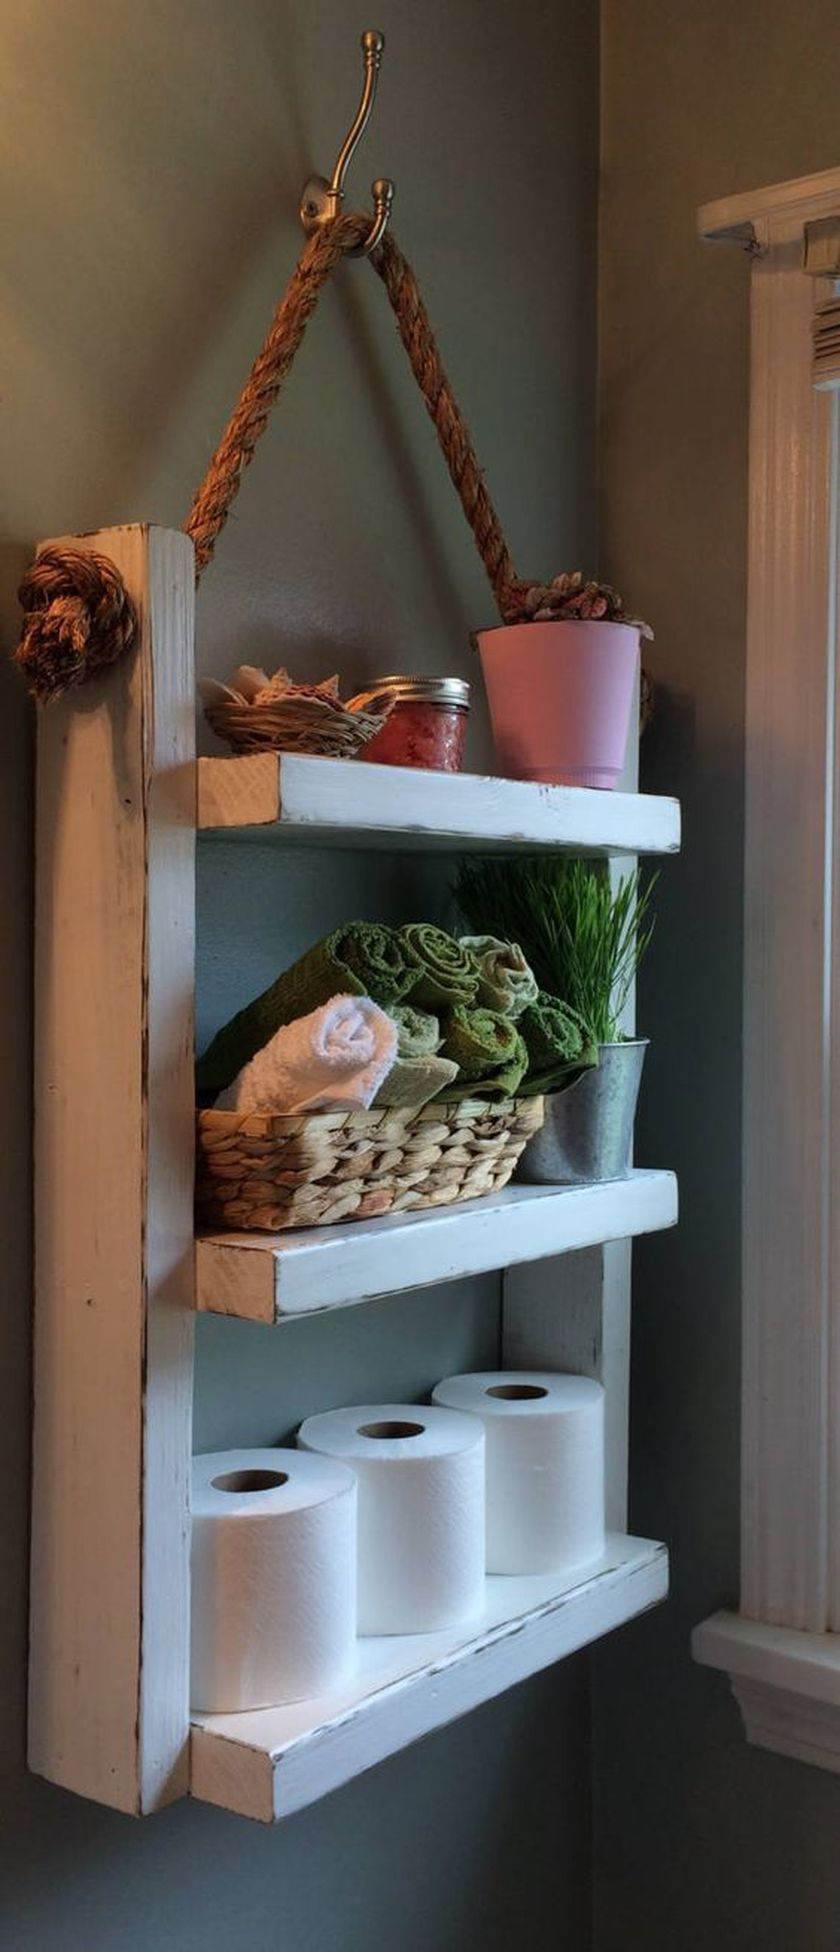 Small Crop Of Bathroom Shelf Decorations